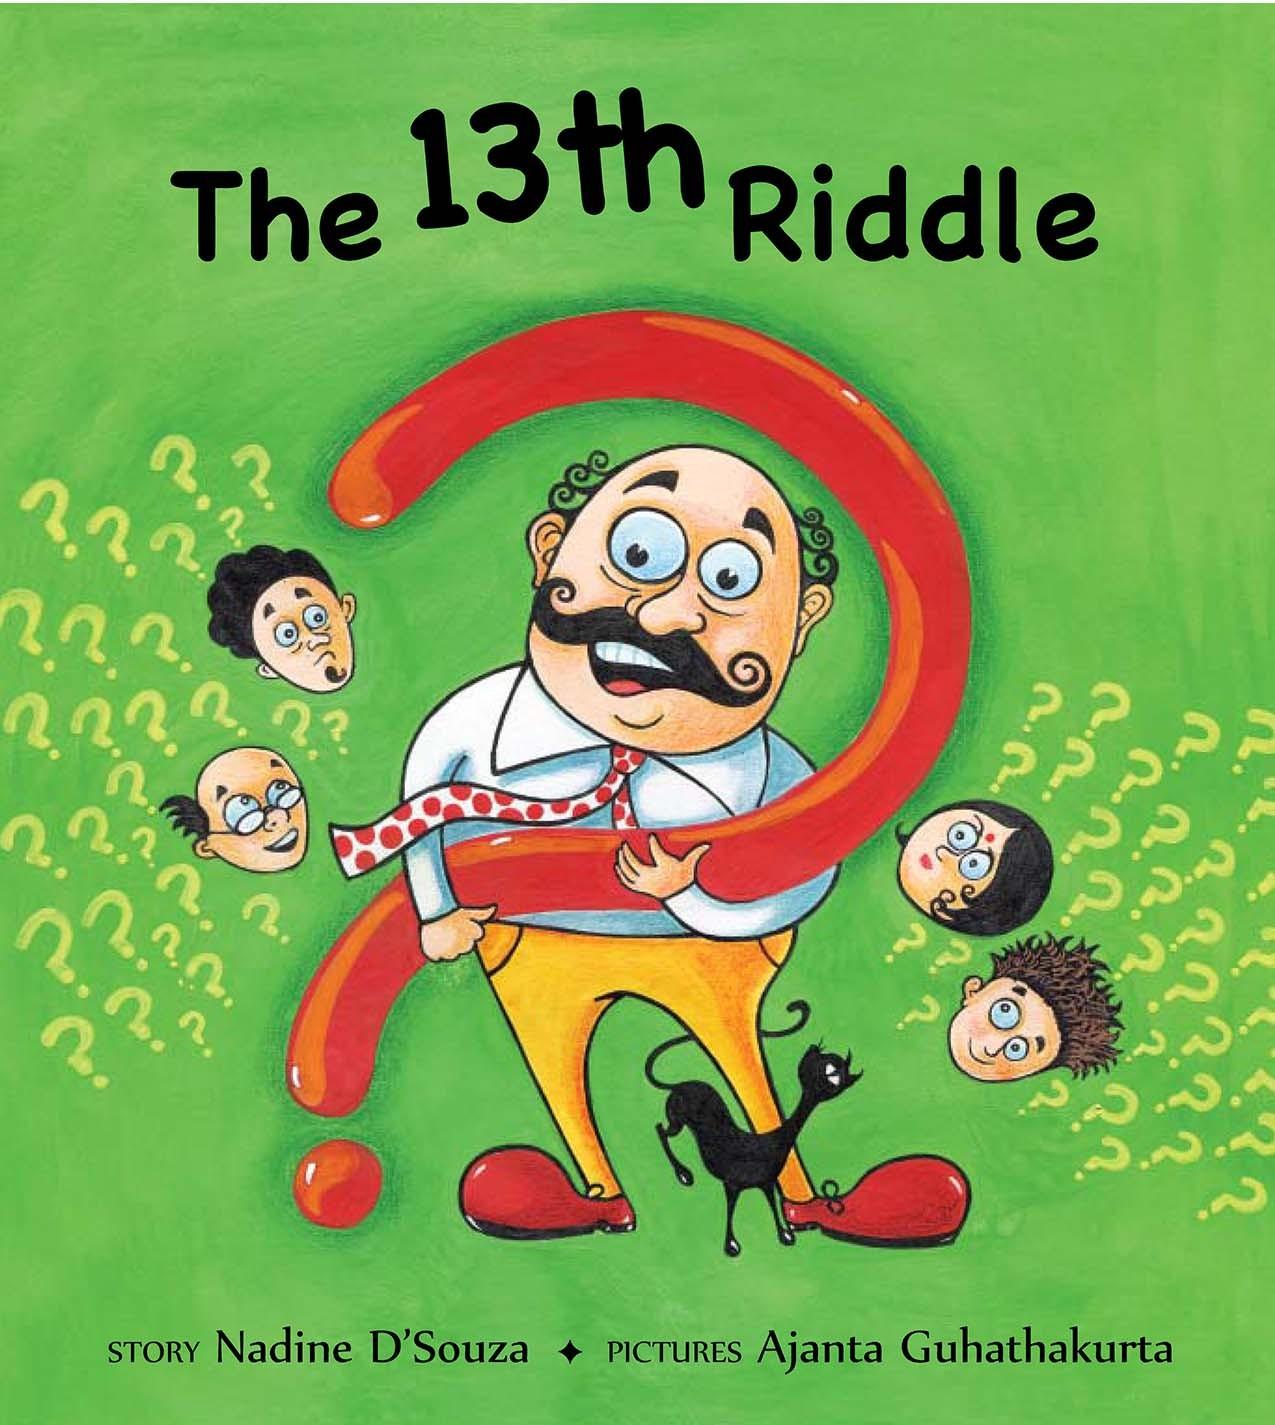 The Thirteenth Riddle